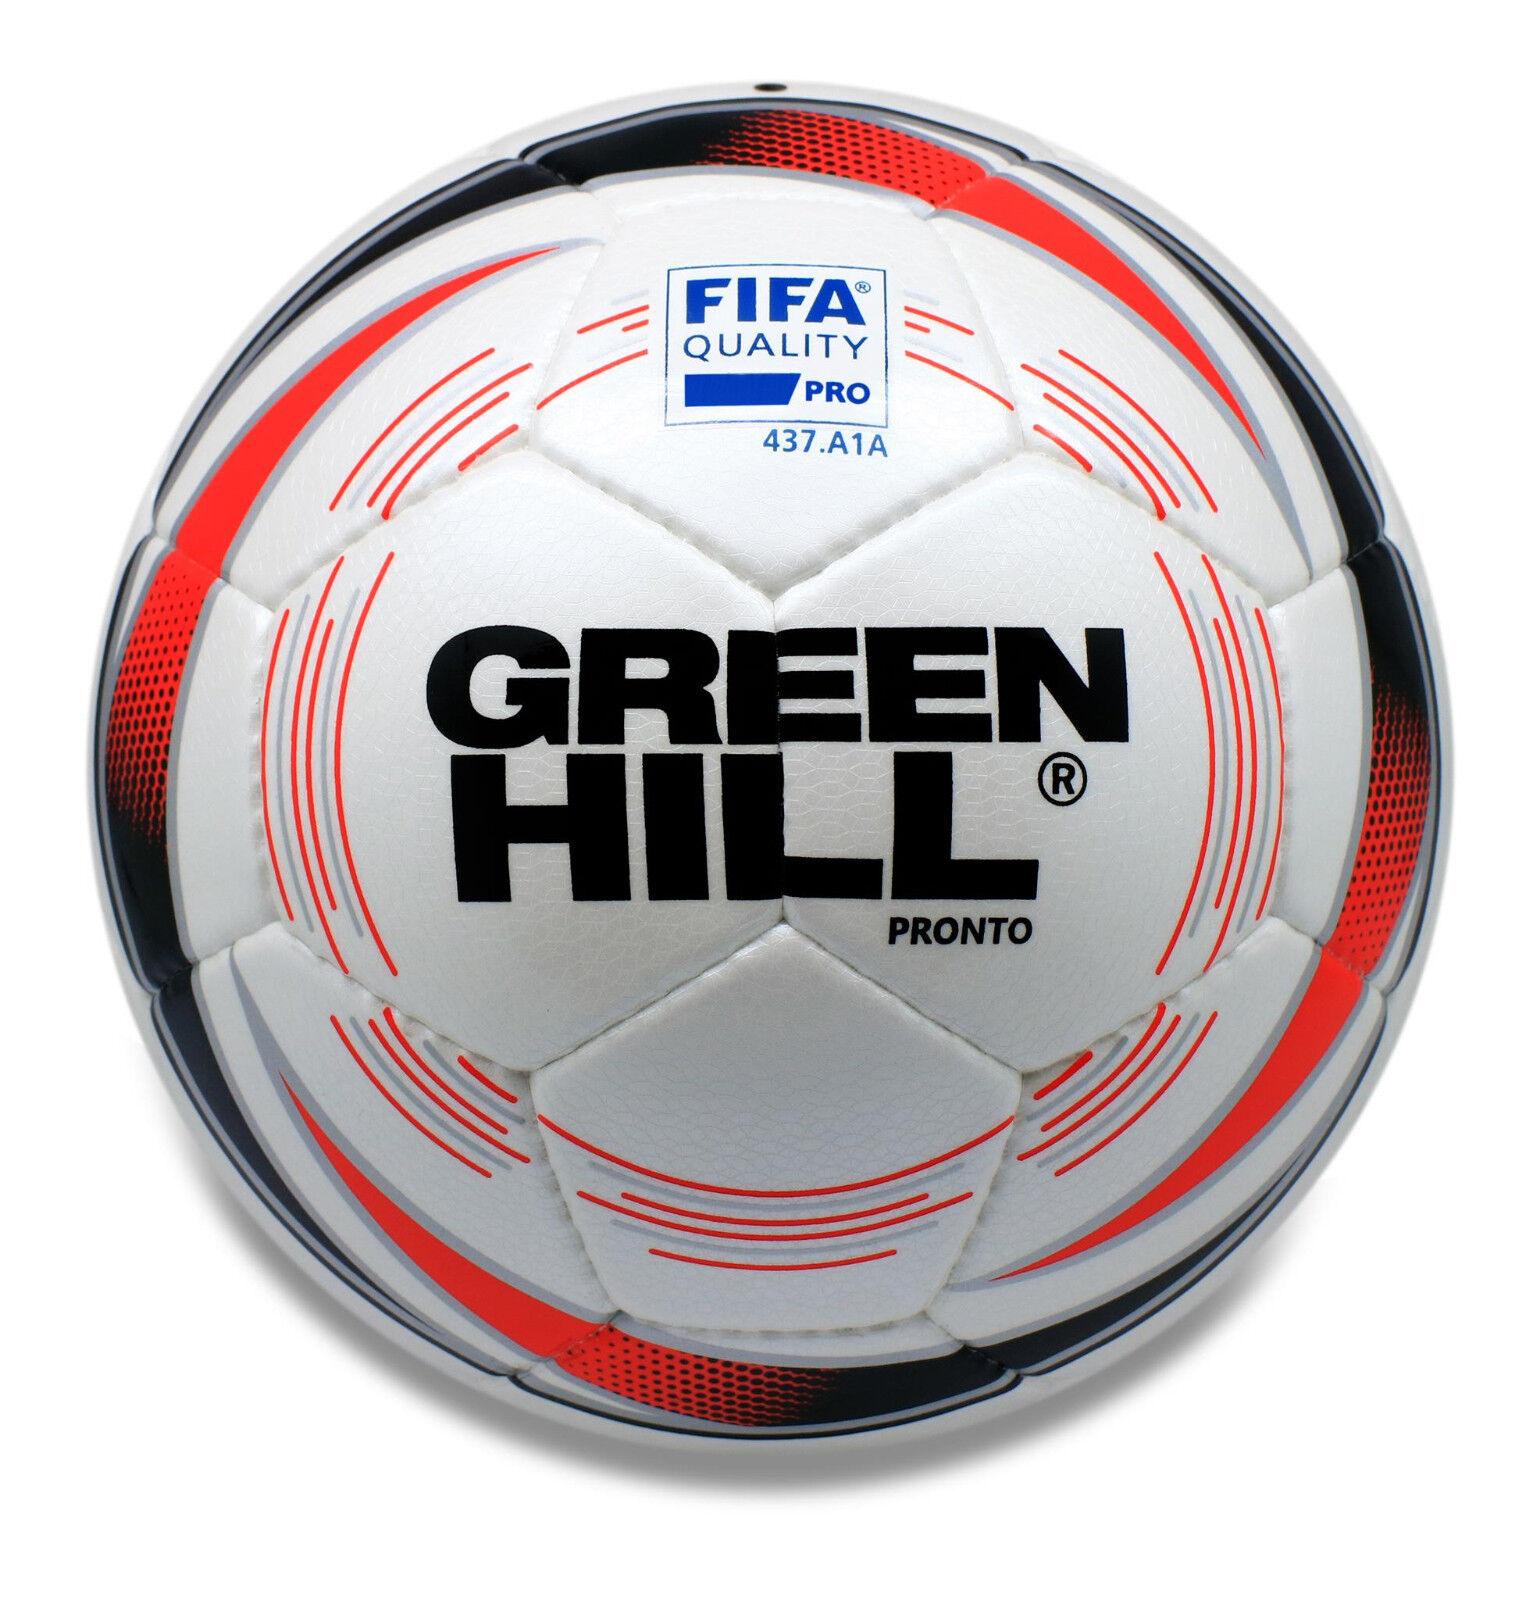 Grün Hill Fußball PRONTO II FIFA APPROVED  | Marke